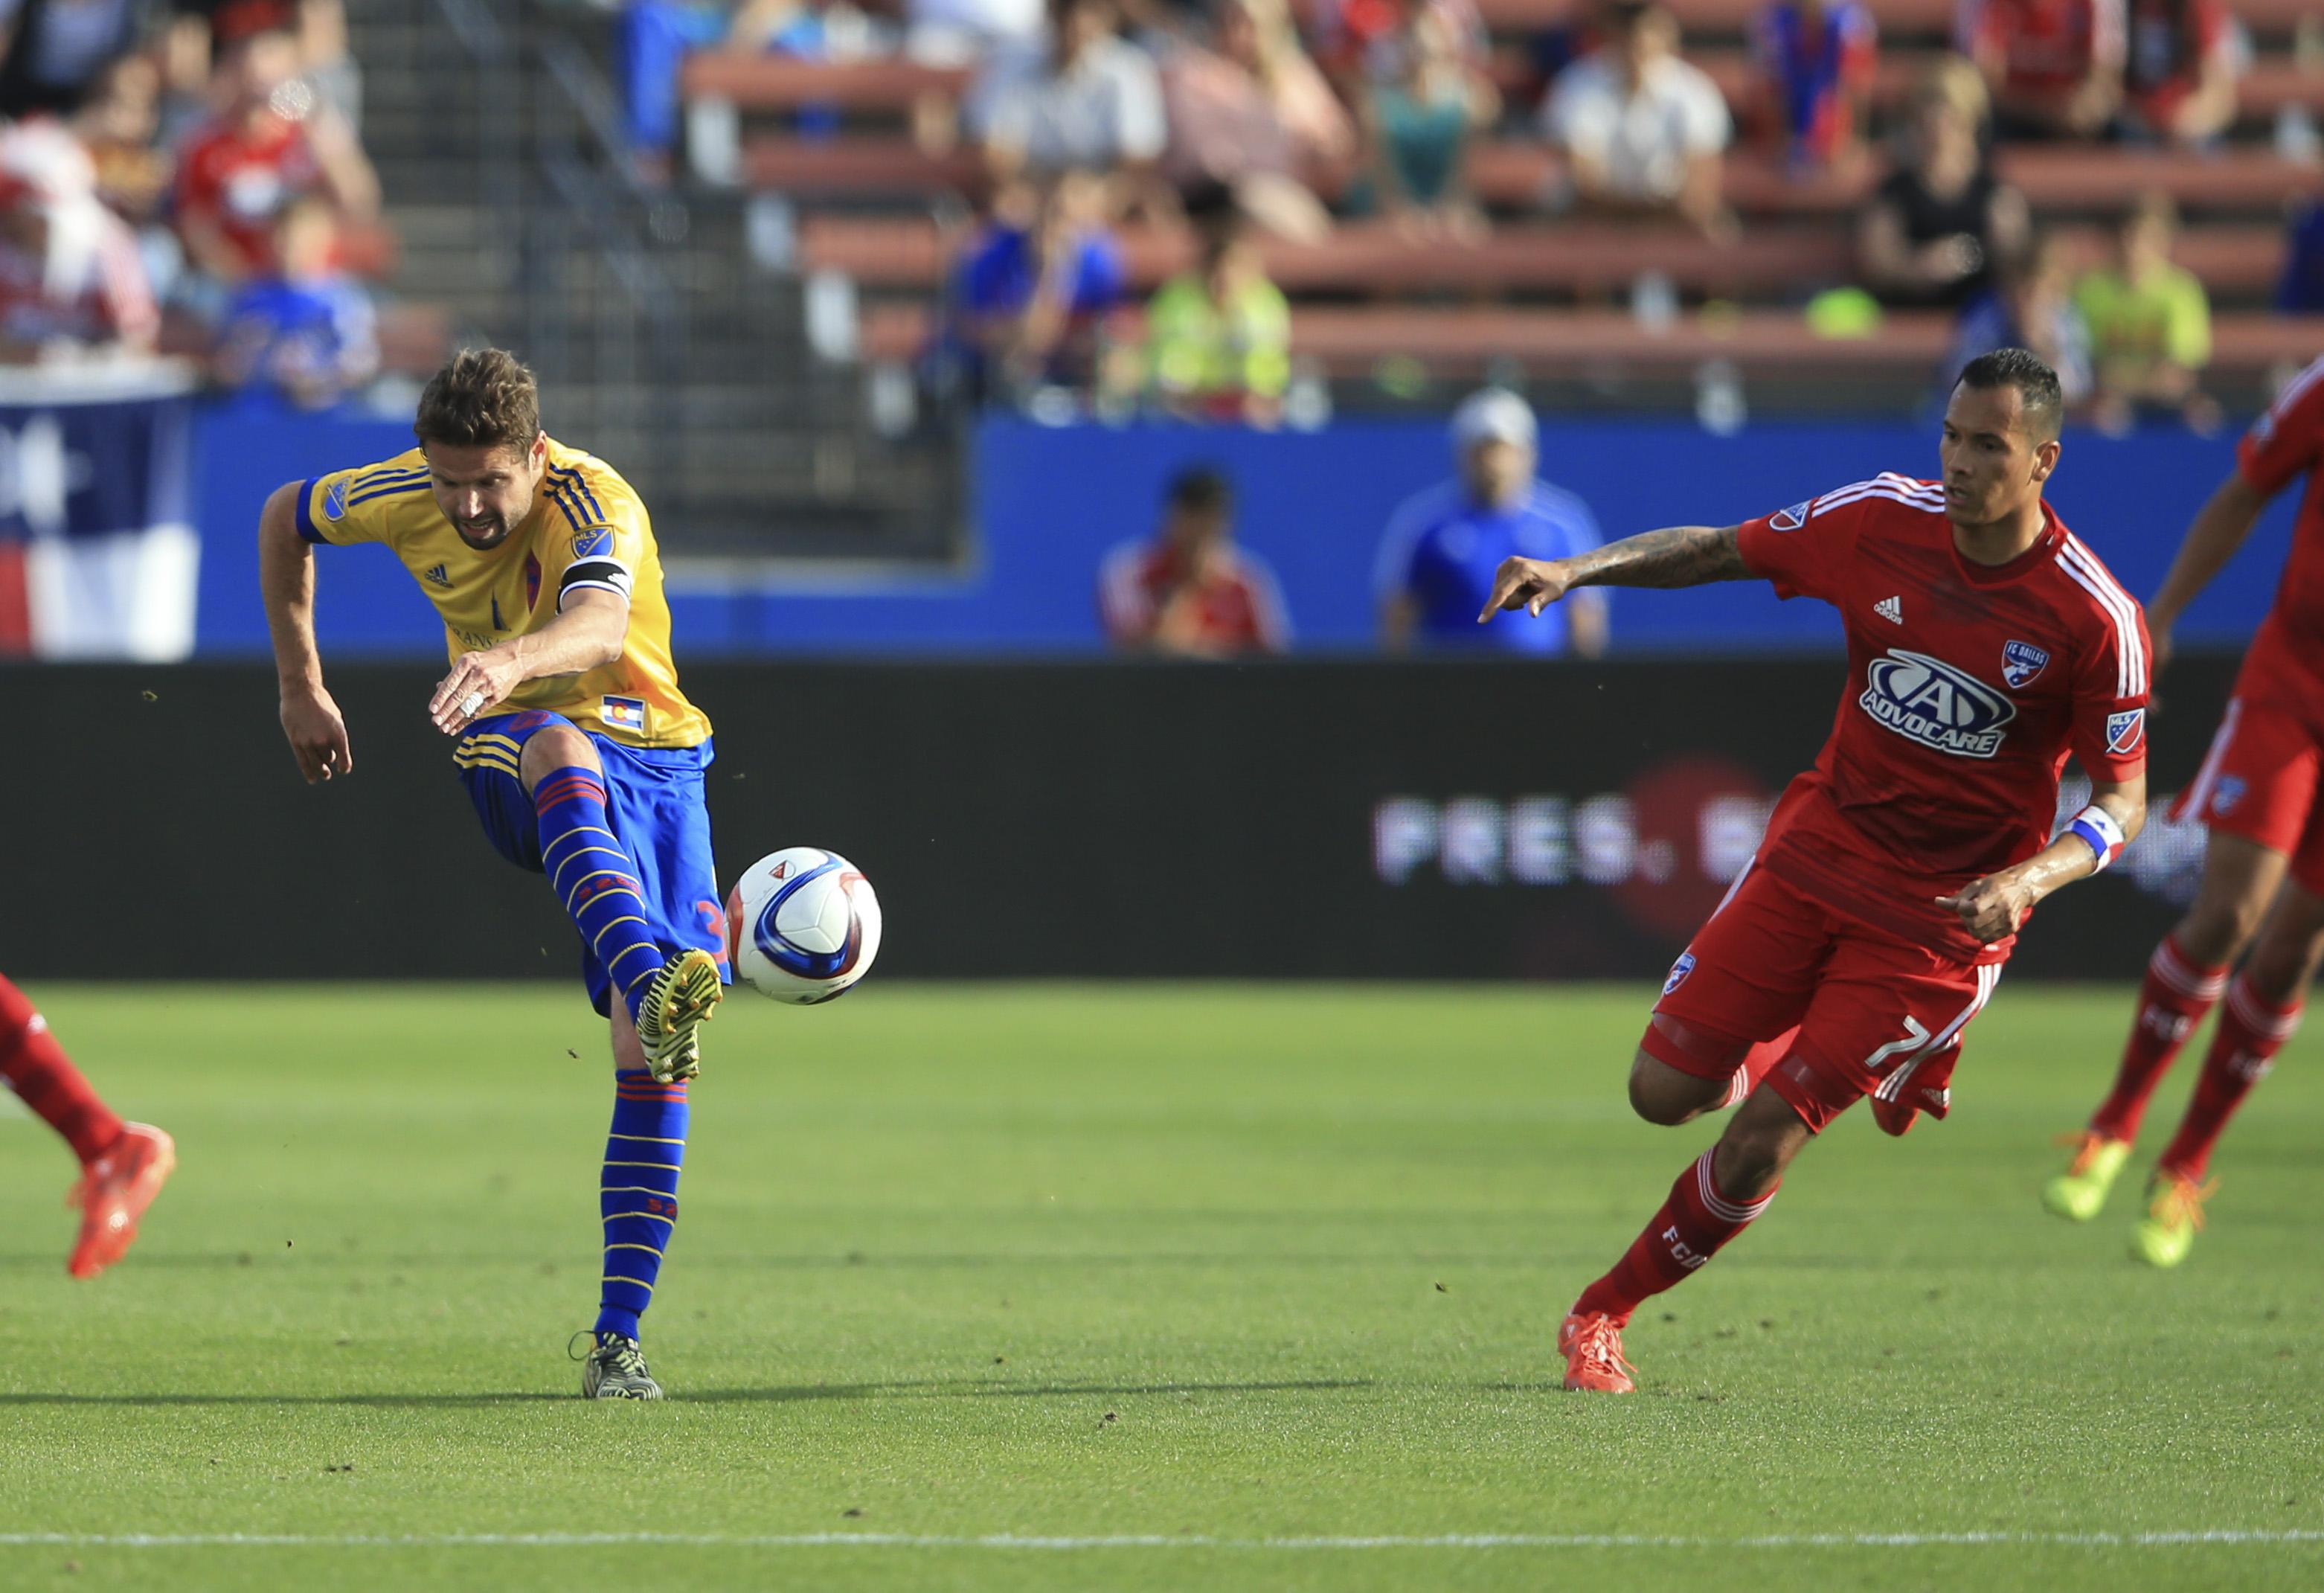 Captain Drew Moor kicks the ball upfield.